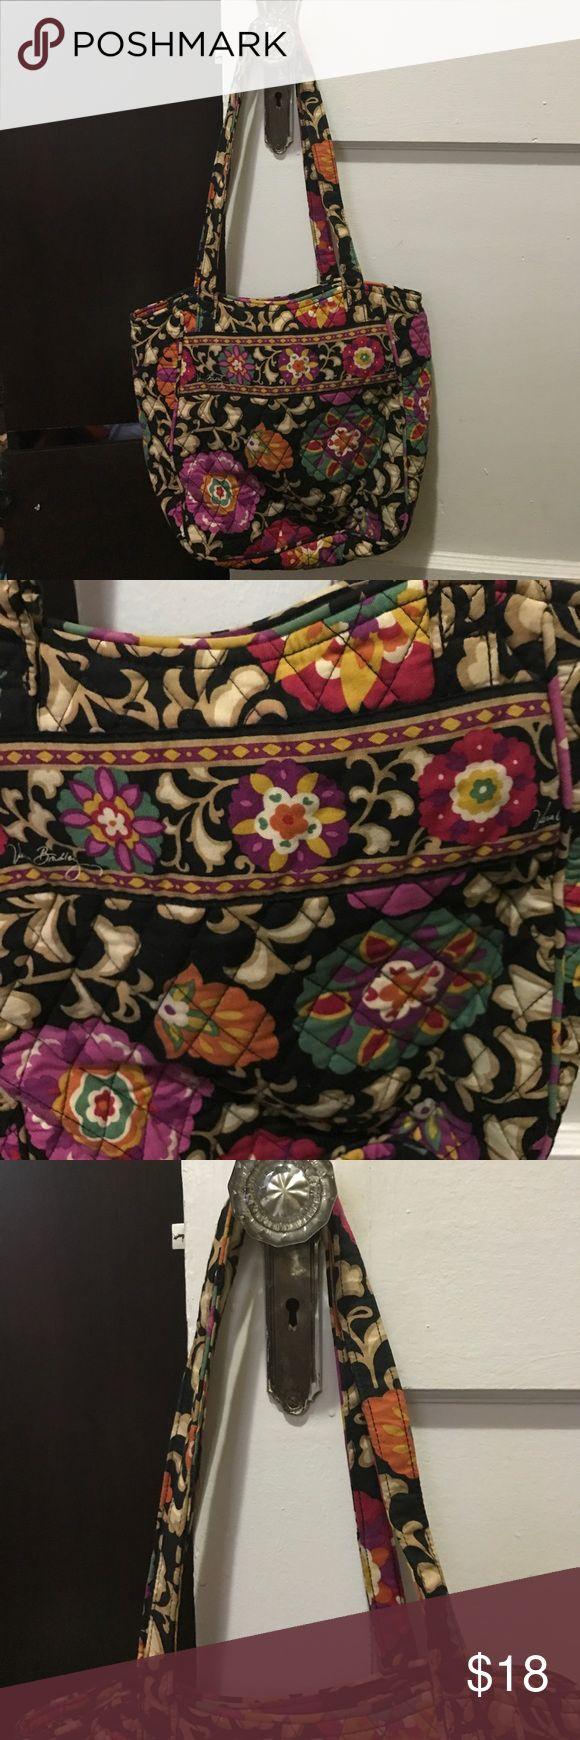 Vera Bradley Tote Bag Used but in great condition. Beautiful Tote bag Vera Bradley Bags Totes